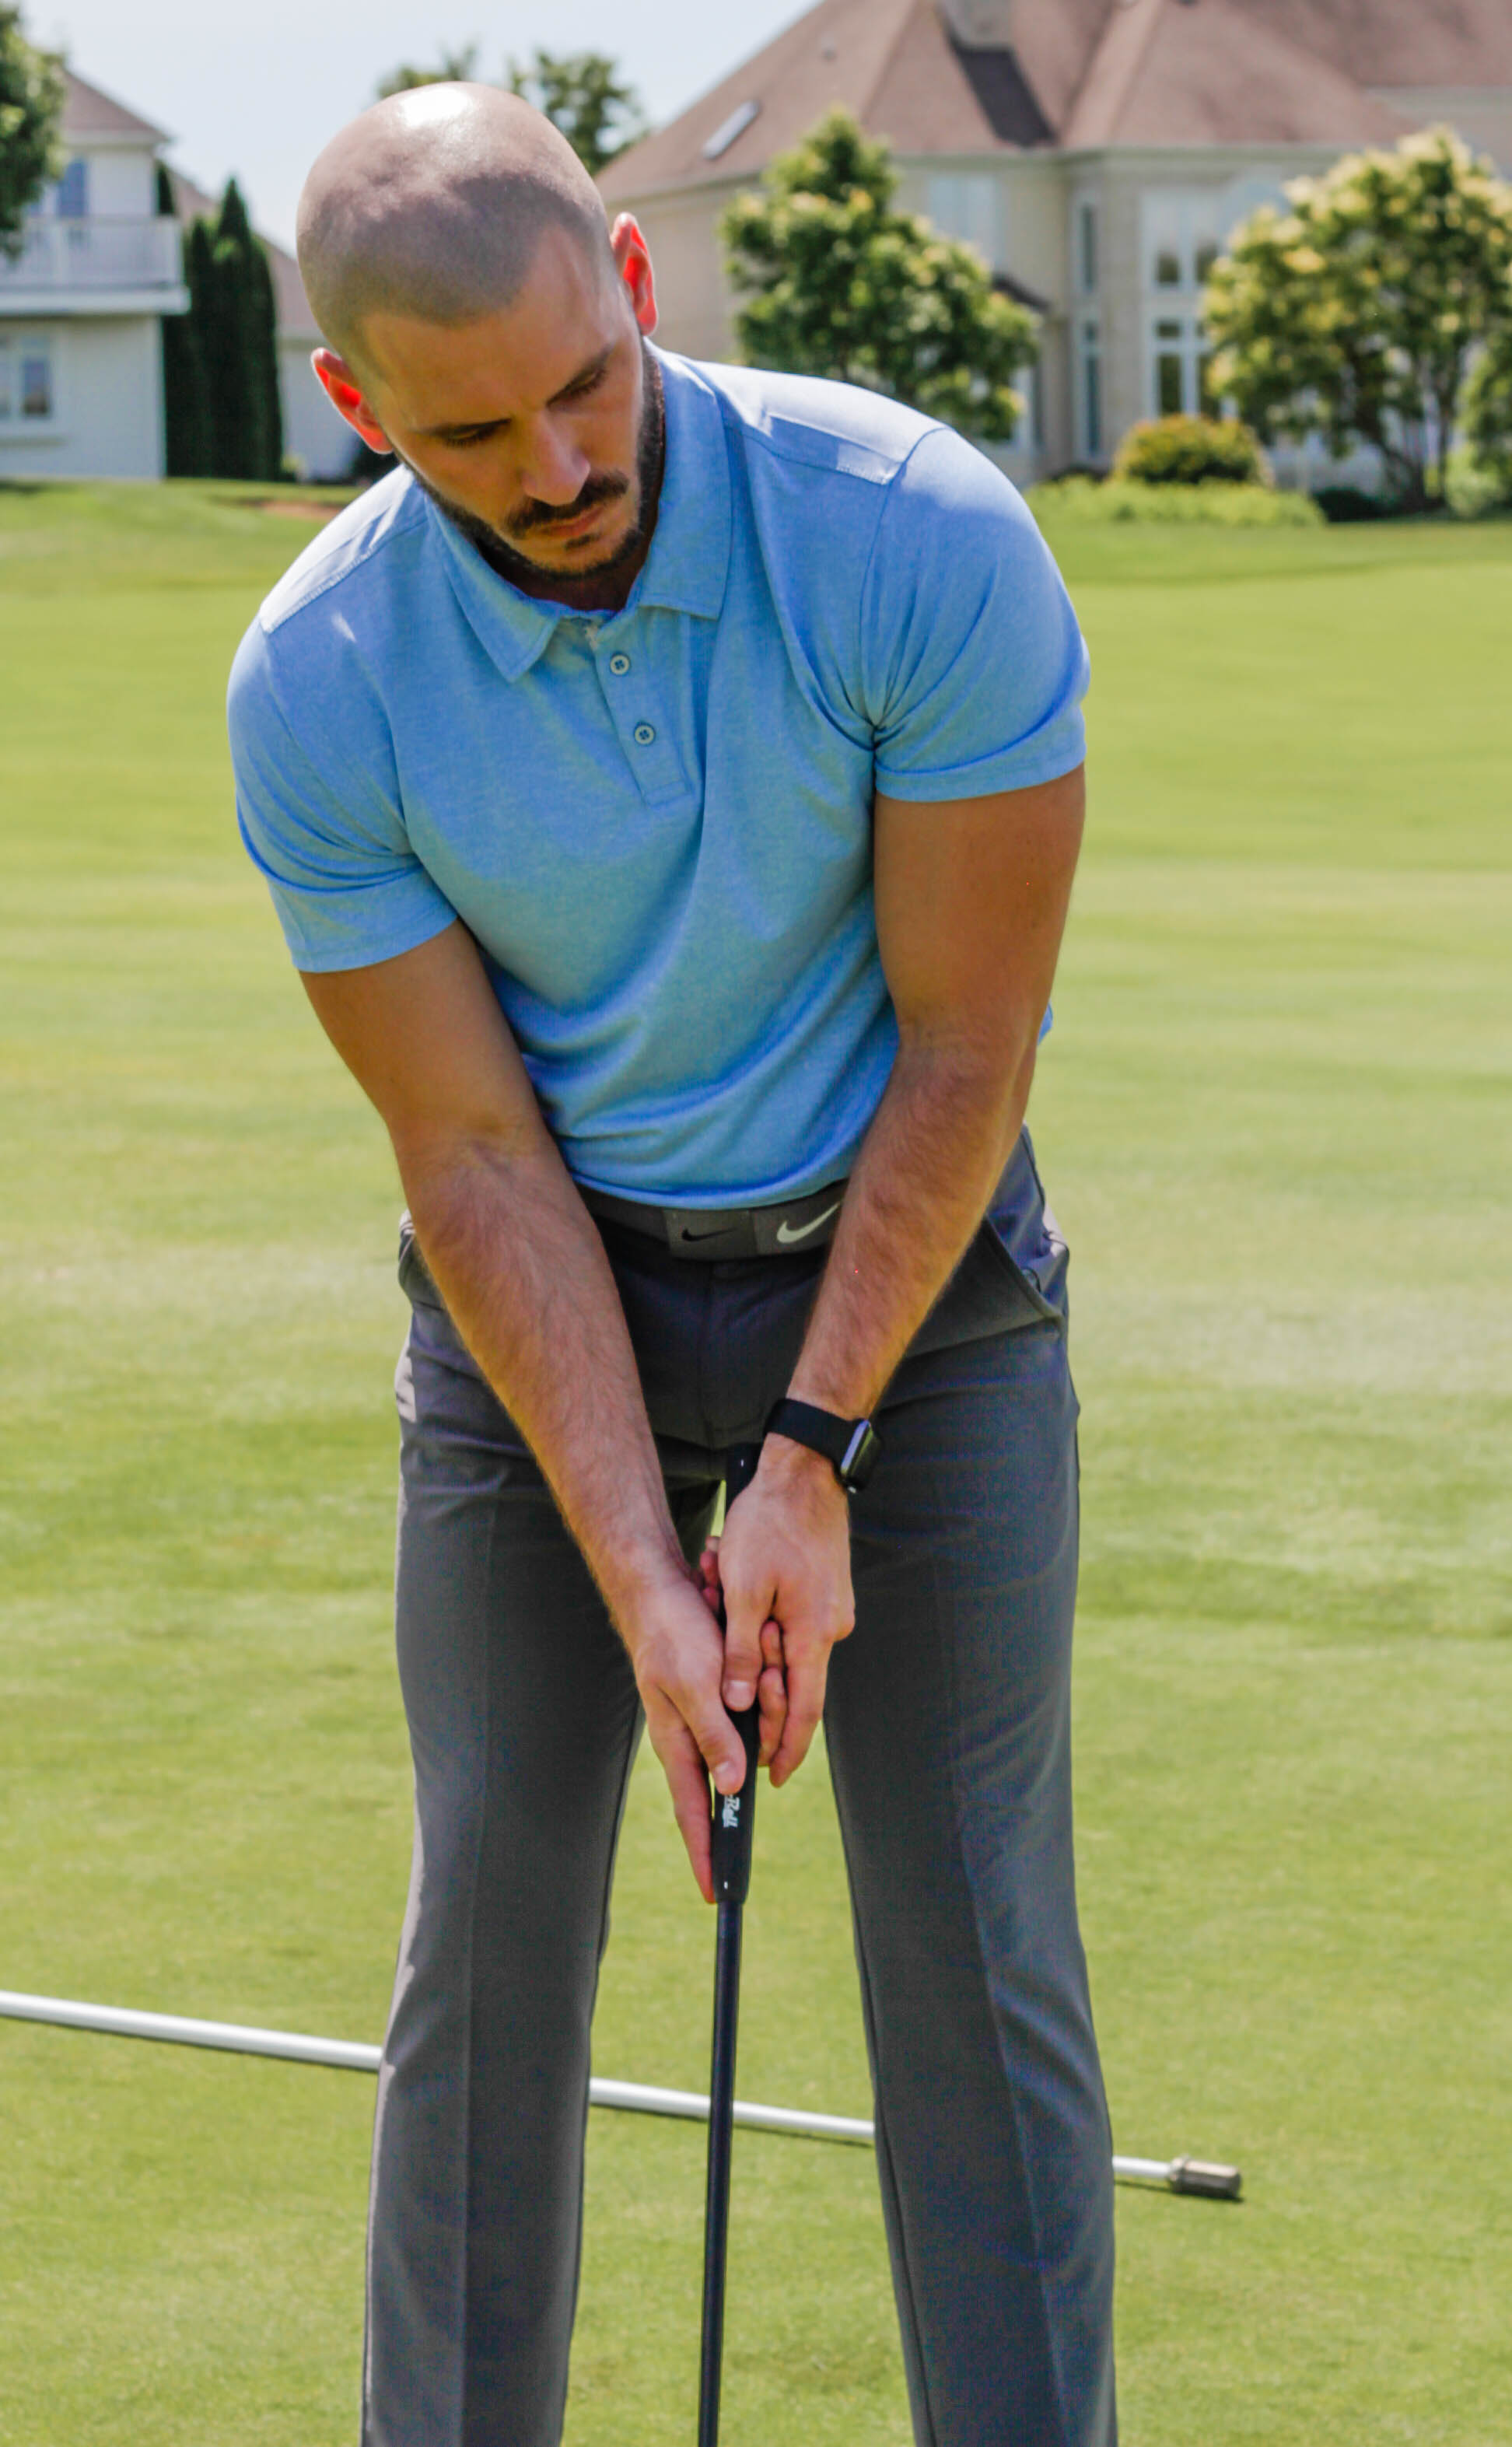 Wearing: The Etiquette Polo Shirt in Carolina Blue